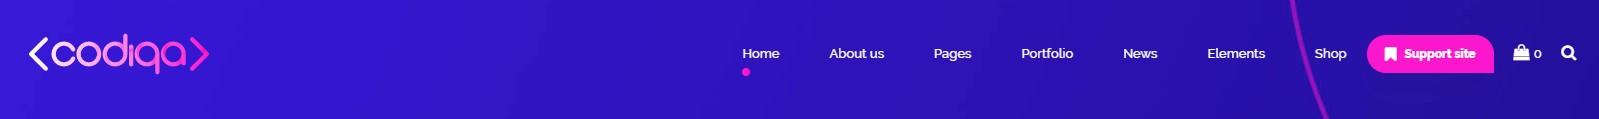 https://documentation.bold-themes.com/codiqa/wp-content/uploads/sites/49/2019/10/menu-horizontal-right.jpg